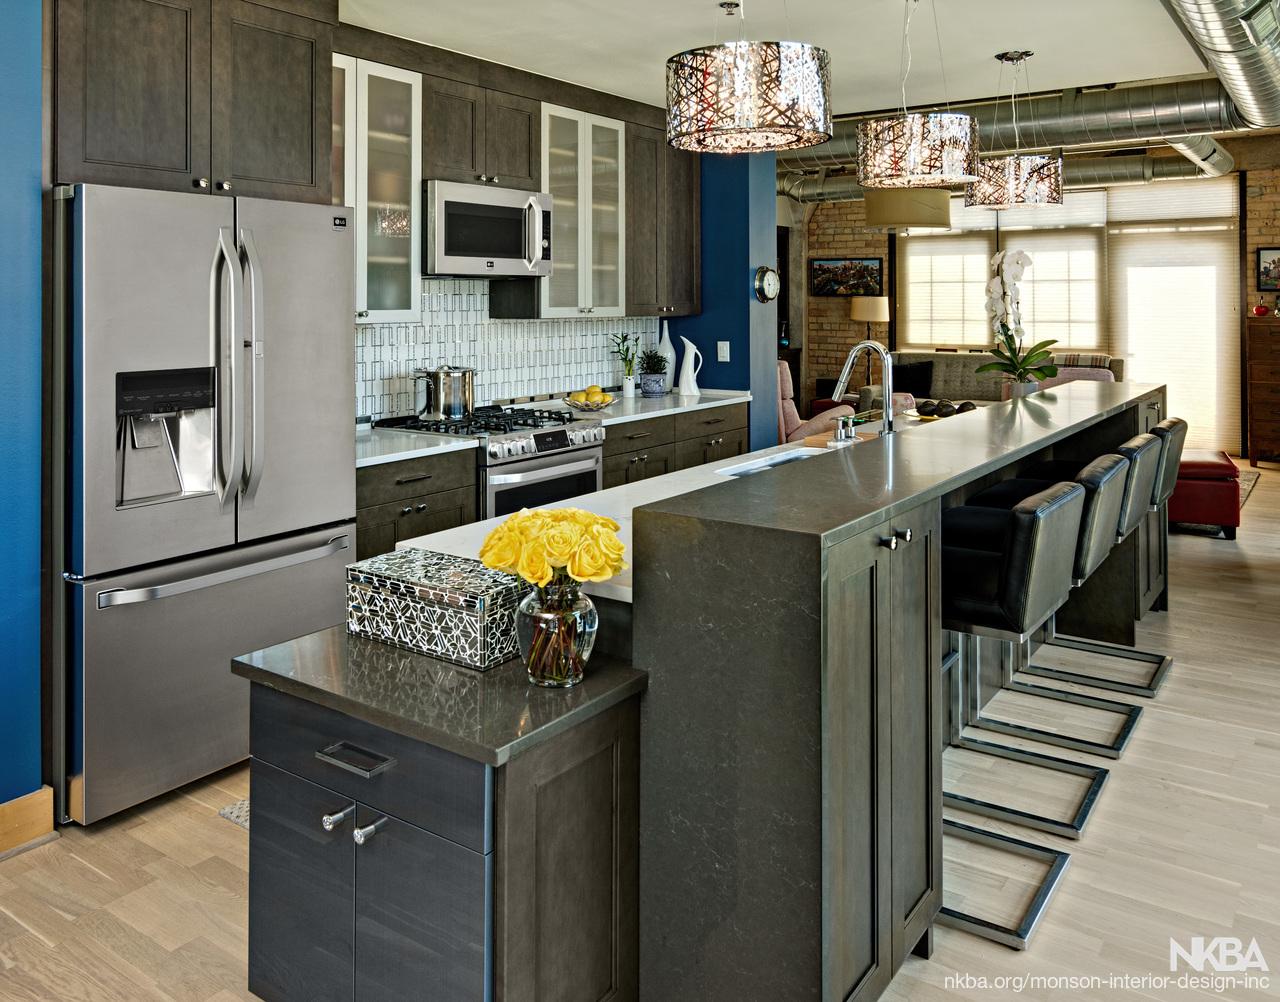 Monson interior design inc nkba - Interior design classes minneapolis ...